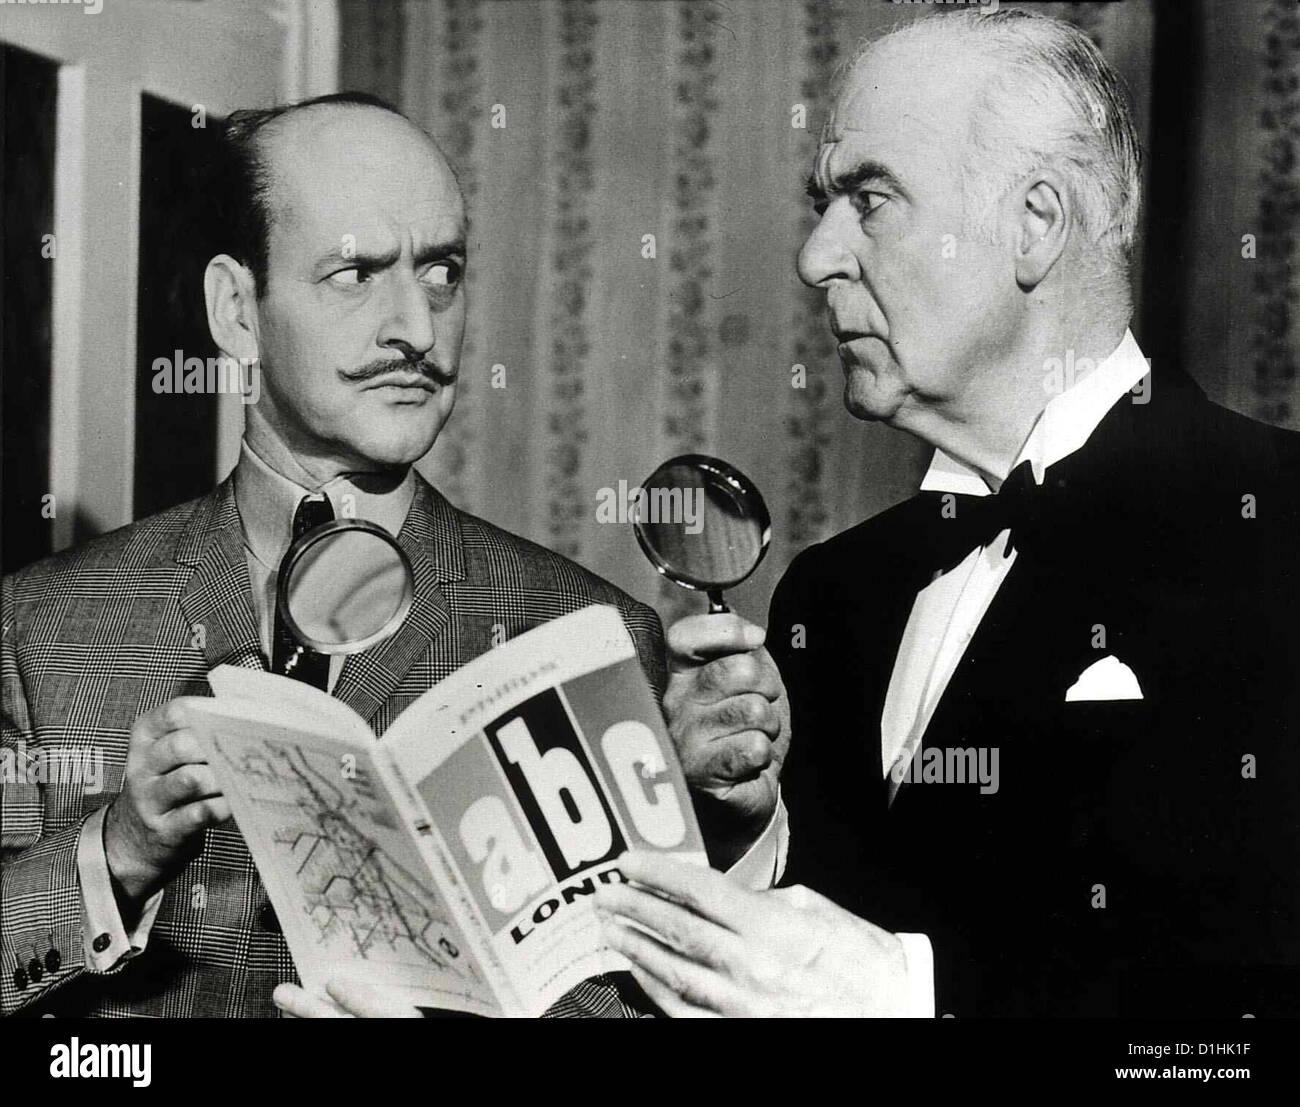 Die Morde Des Herrn Abc  Alphabet Murders,  Tony Randall, Austin Trevor Hercule Poirot (Tony Randall,l) und Judson - Stock Image